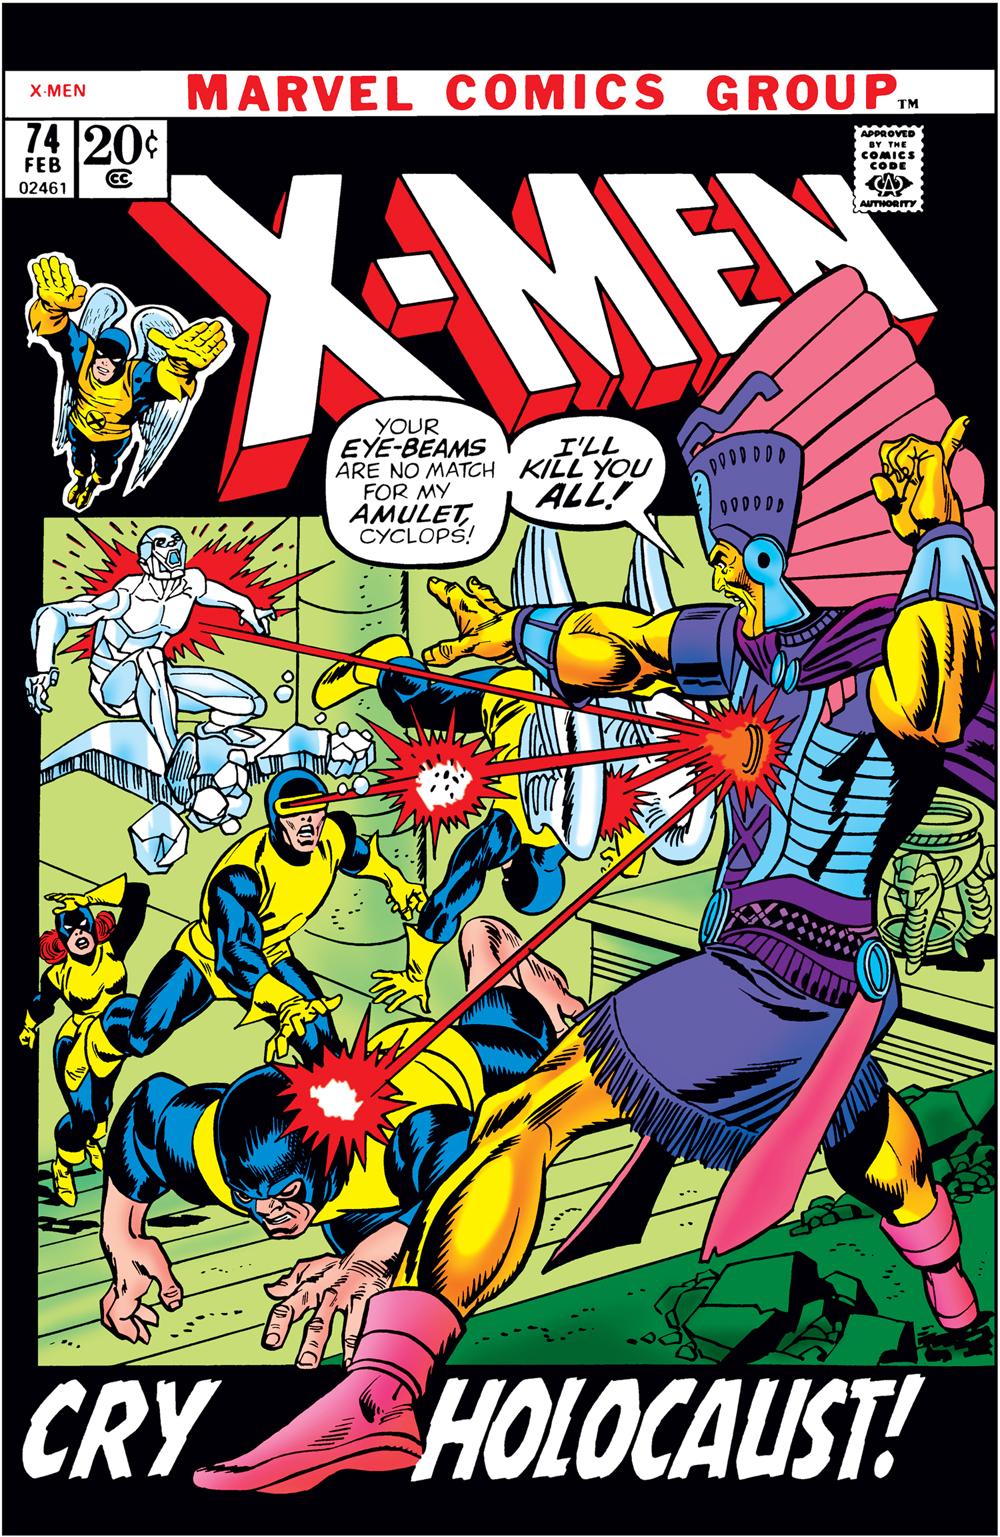 Uncanny X-Men (1963) #74